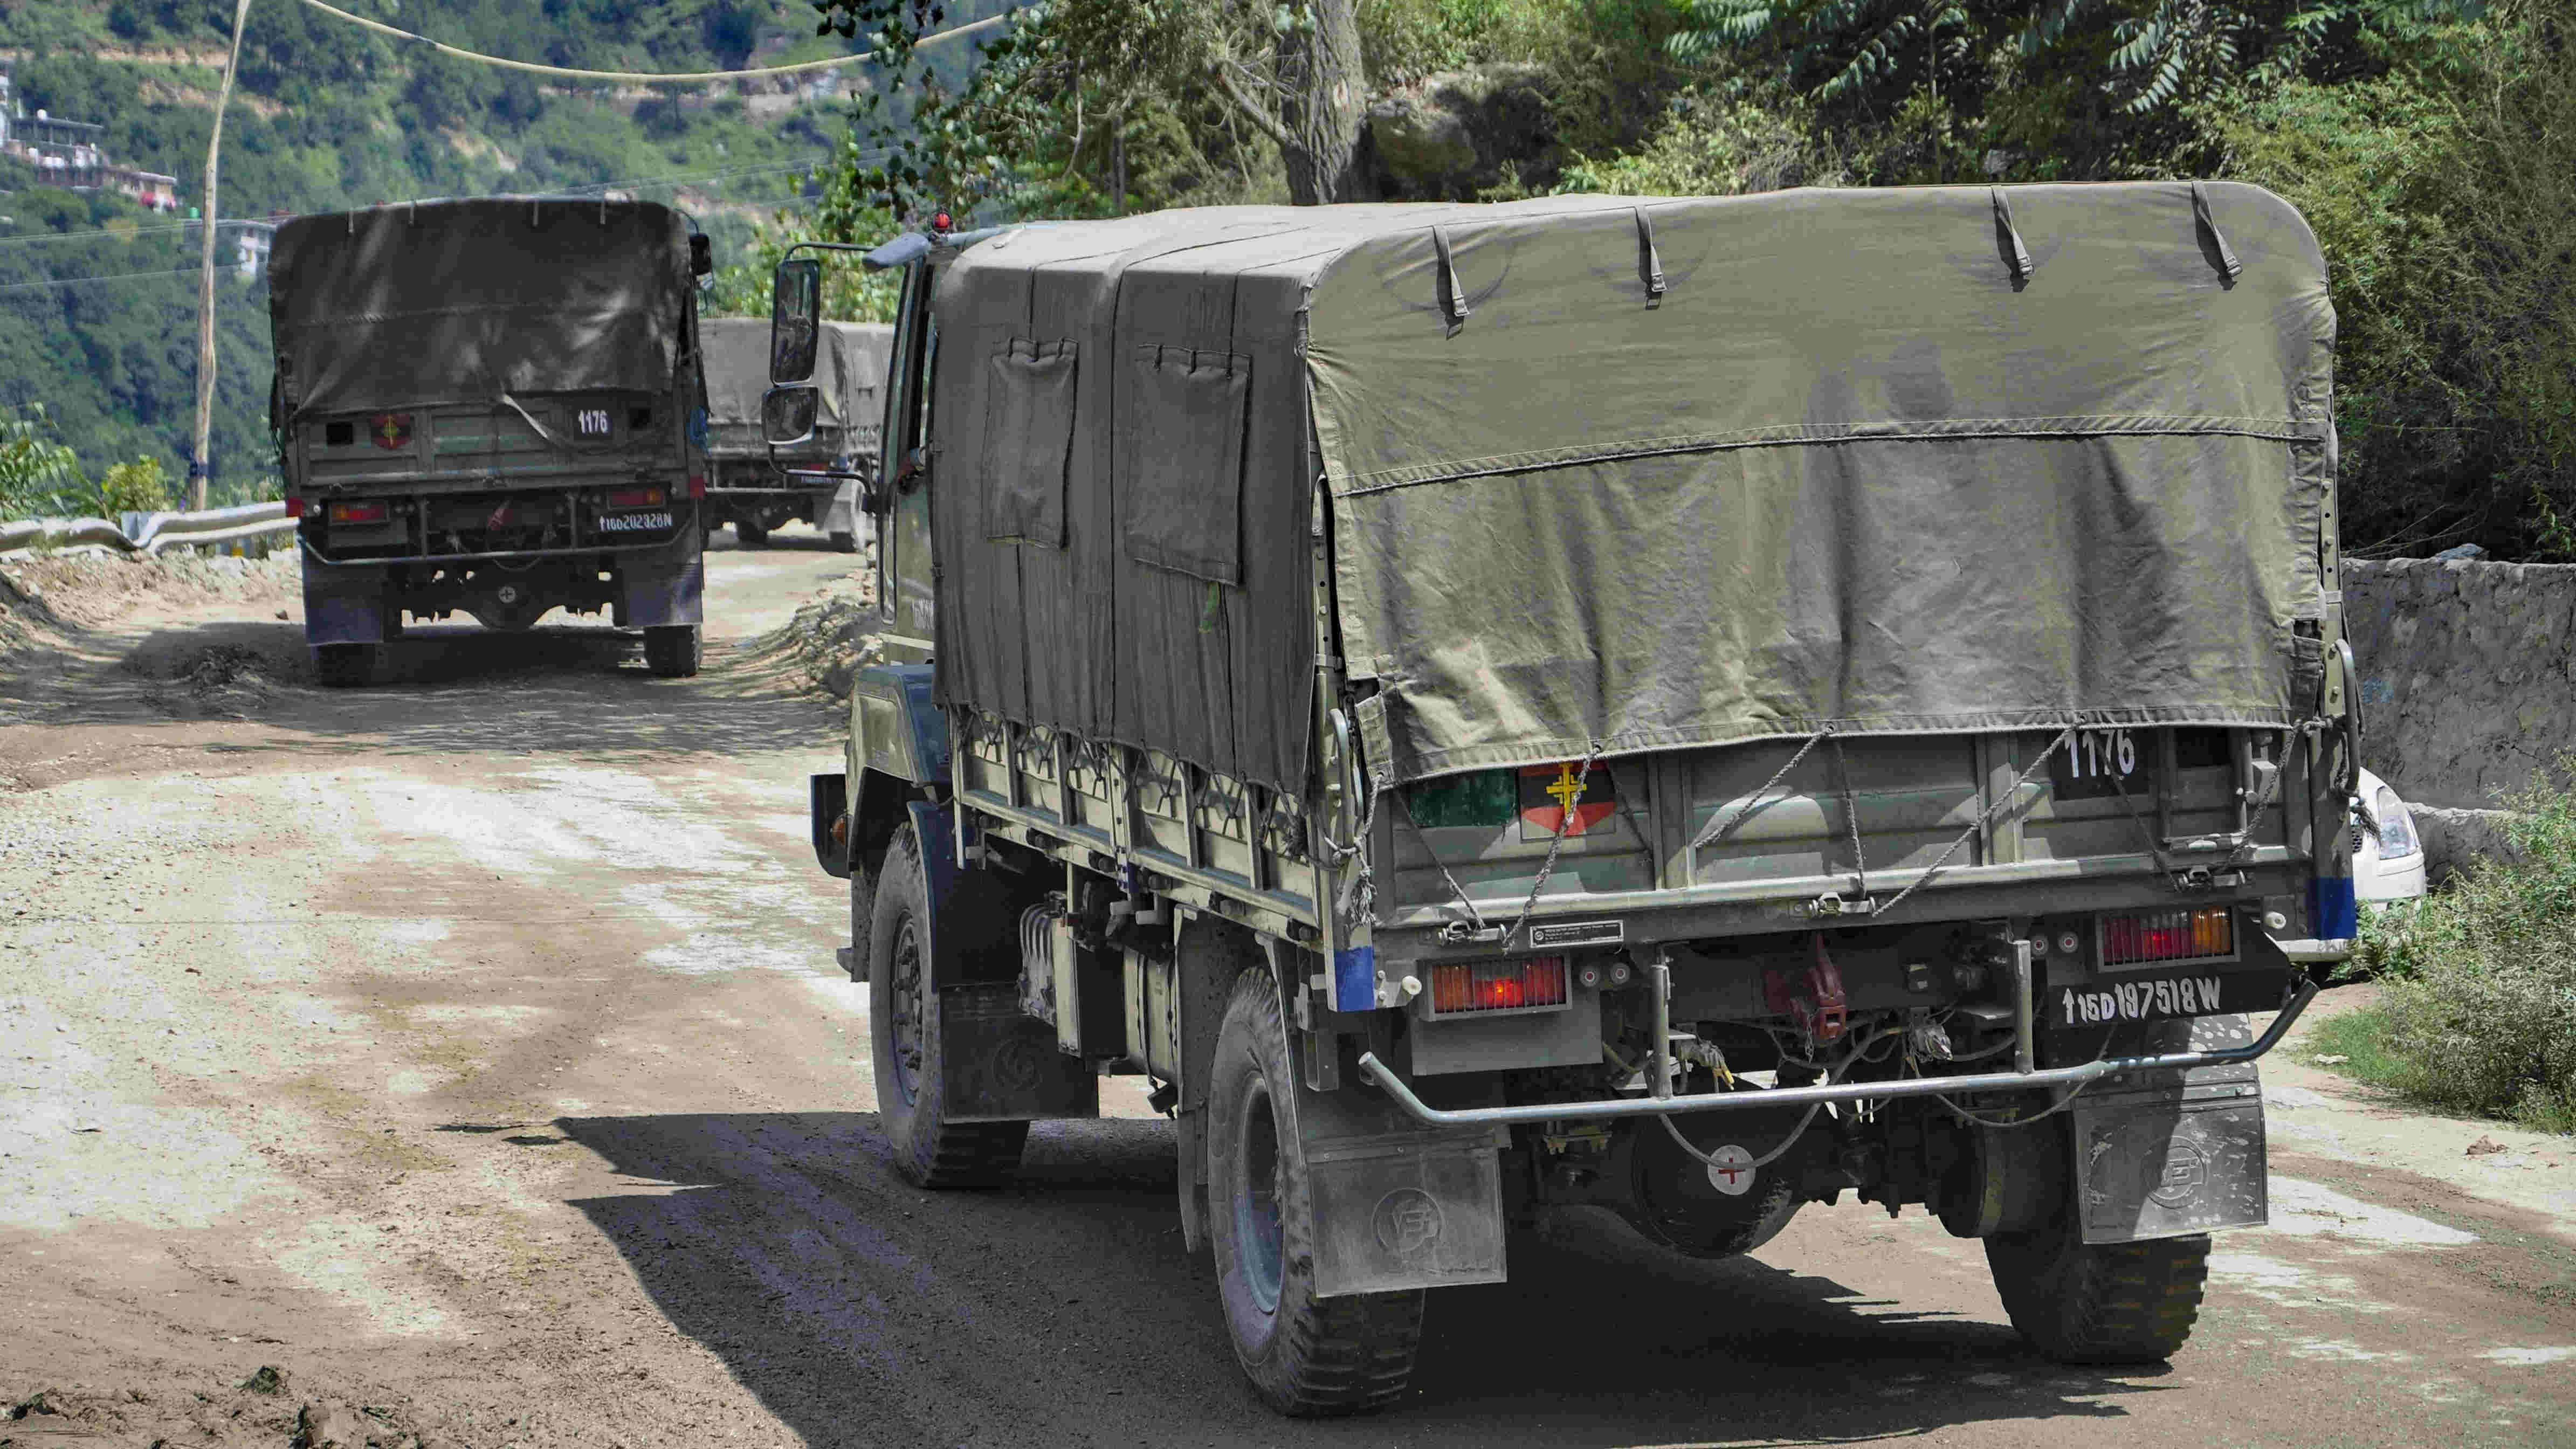 Army trucks move towards Ladakh via Leh–Manali Highway in Manali on Sunday.